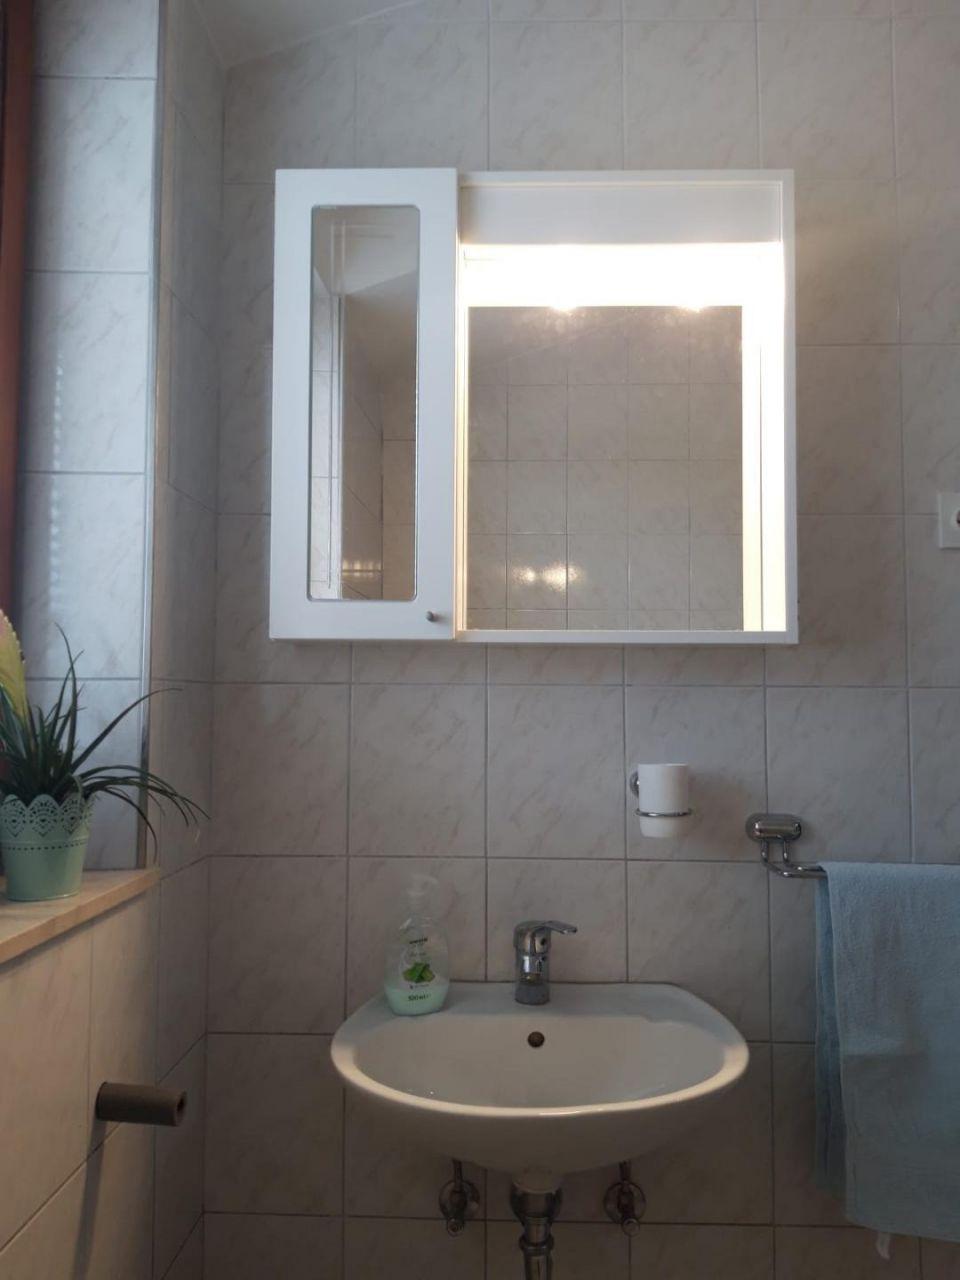 Aпартамент Apartment DK A1 Tribunj, Riviera Sibenik 52093, Tribunj, , Šibensko-kninska